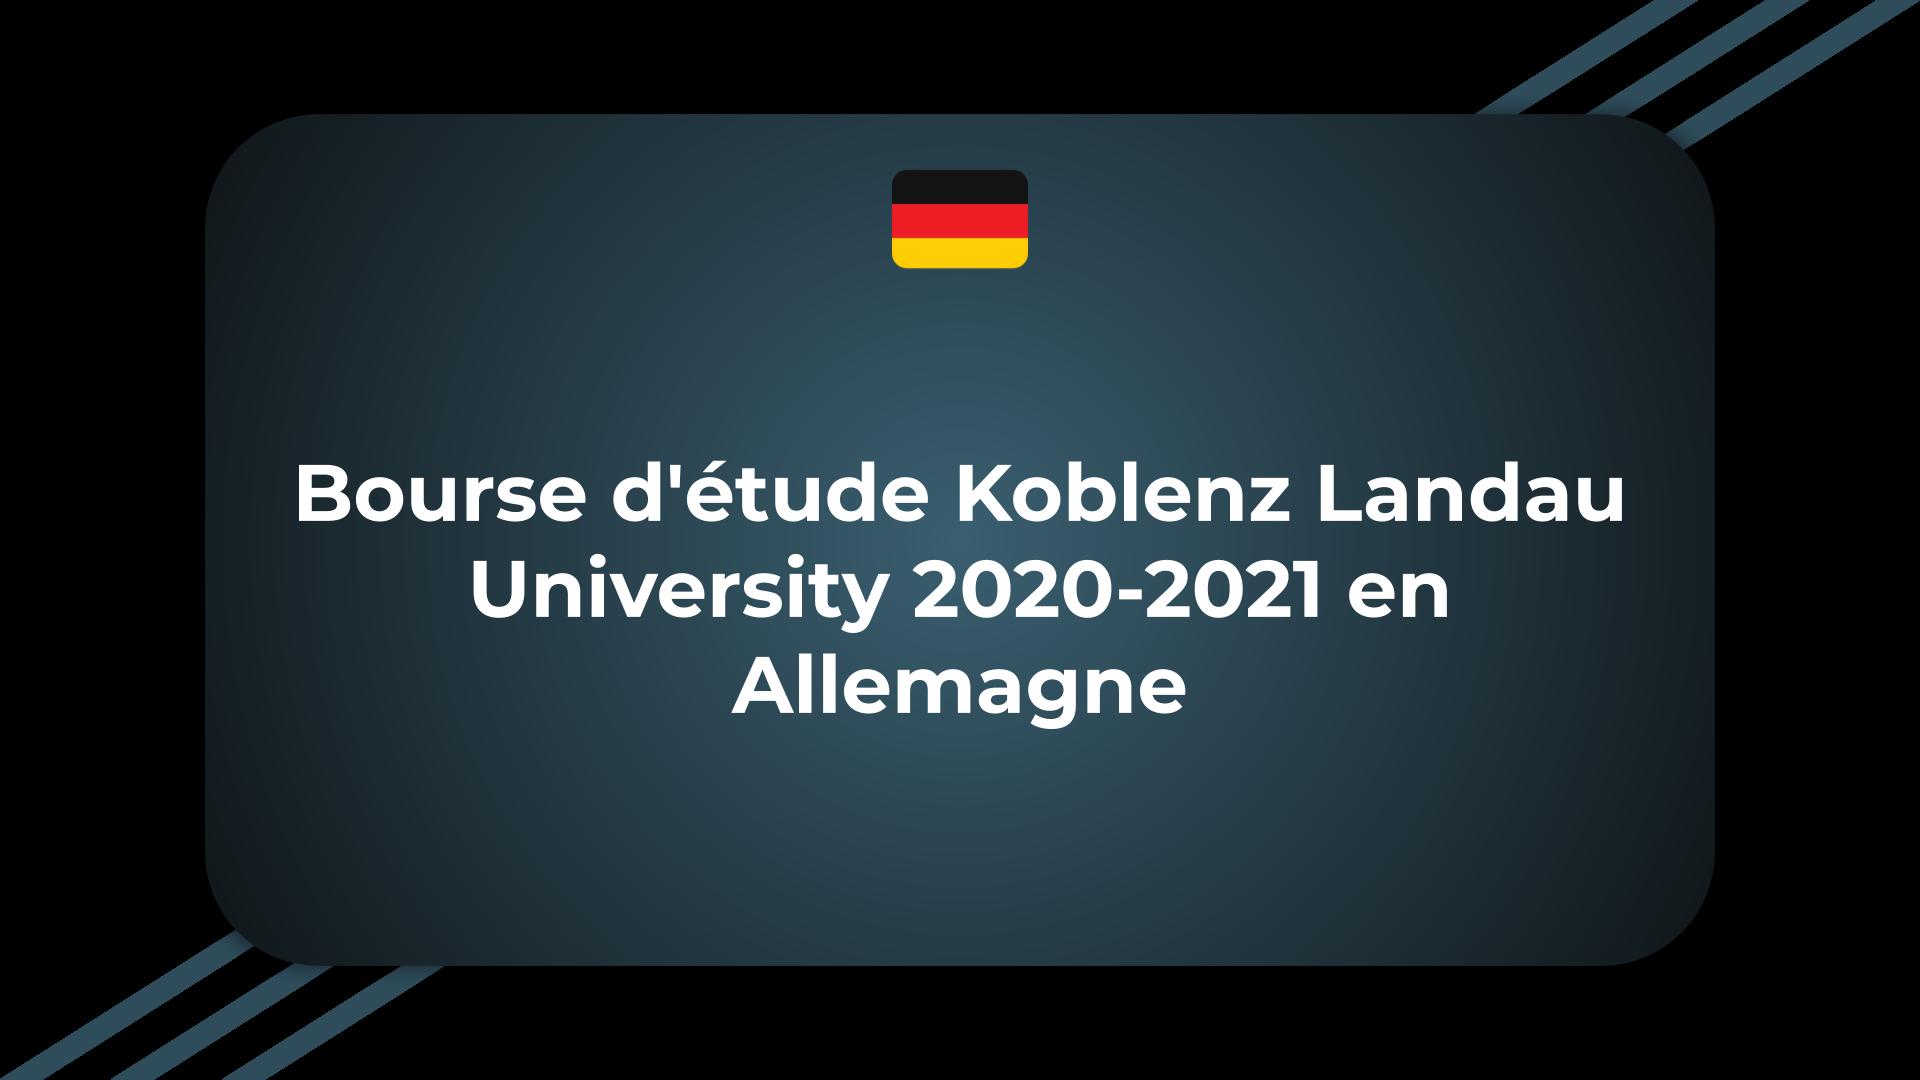 Bourse d'étude Koblenz Landau University